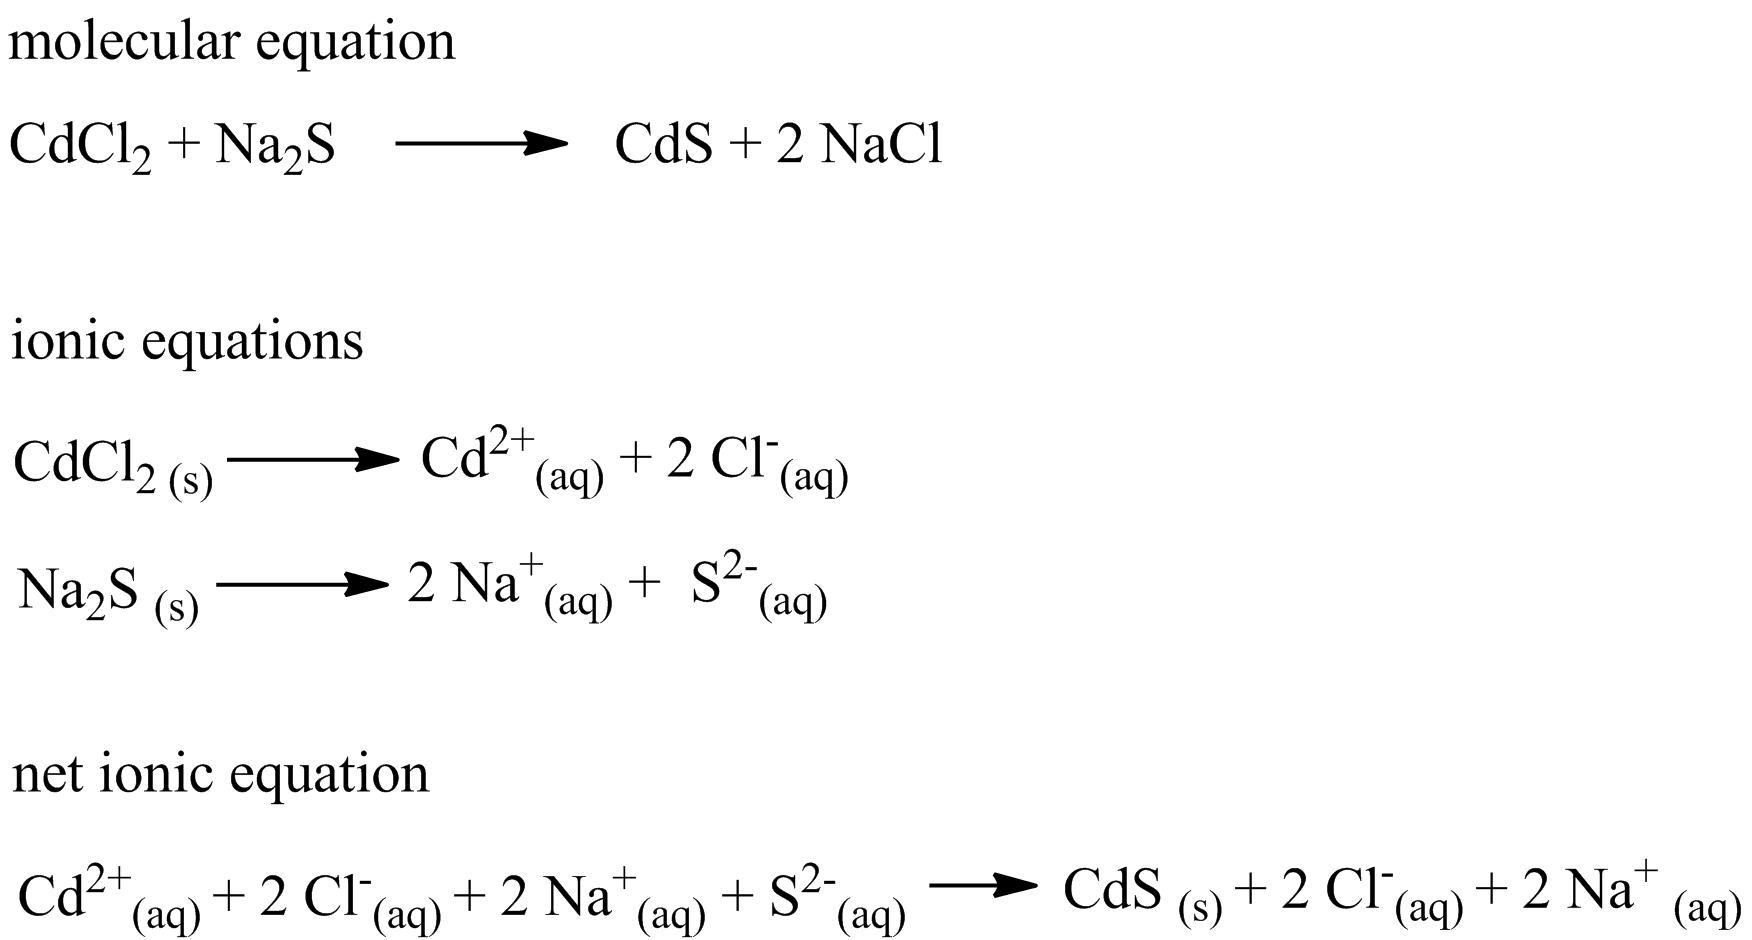 Please Help Stat When Aqueous Solutions Of Cadmium